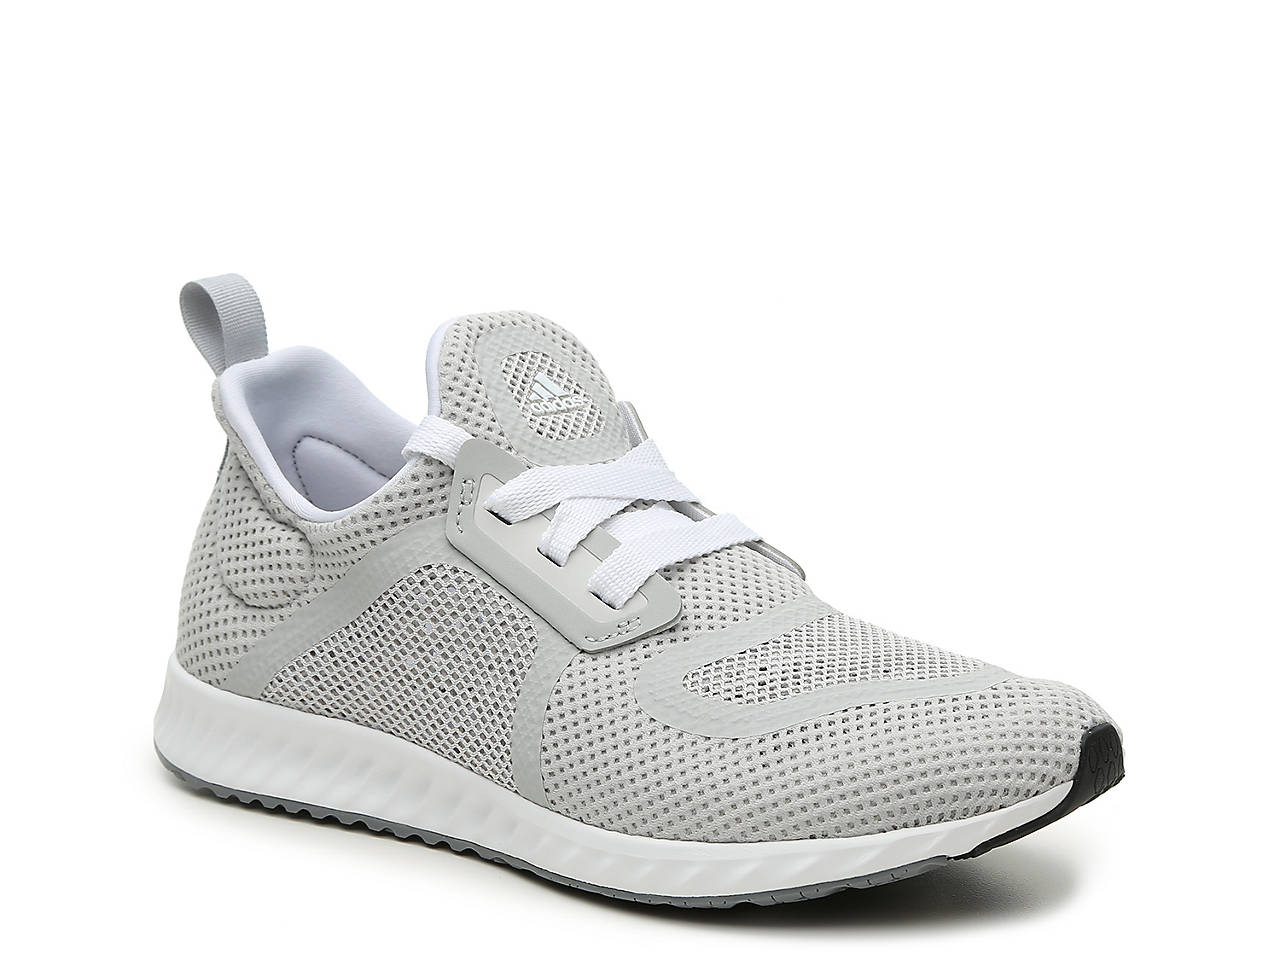 adidas Edge Lux Clima Lightweight Running Shoe - Women s Women s ... cac151a65